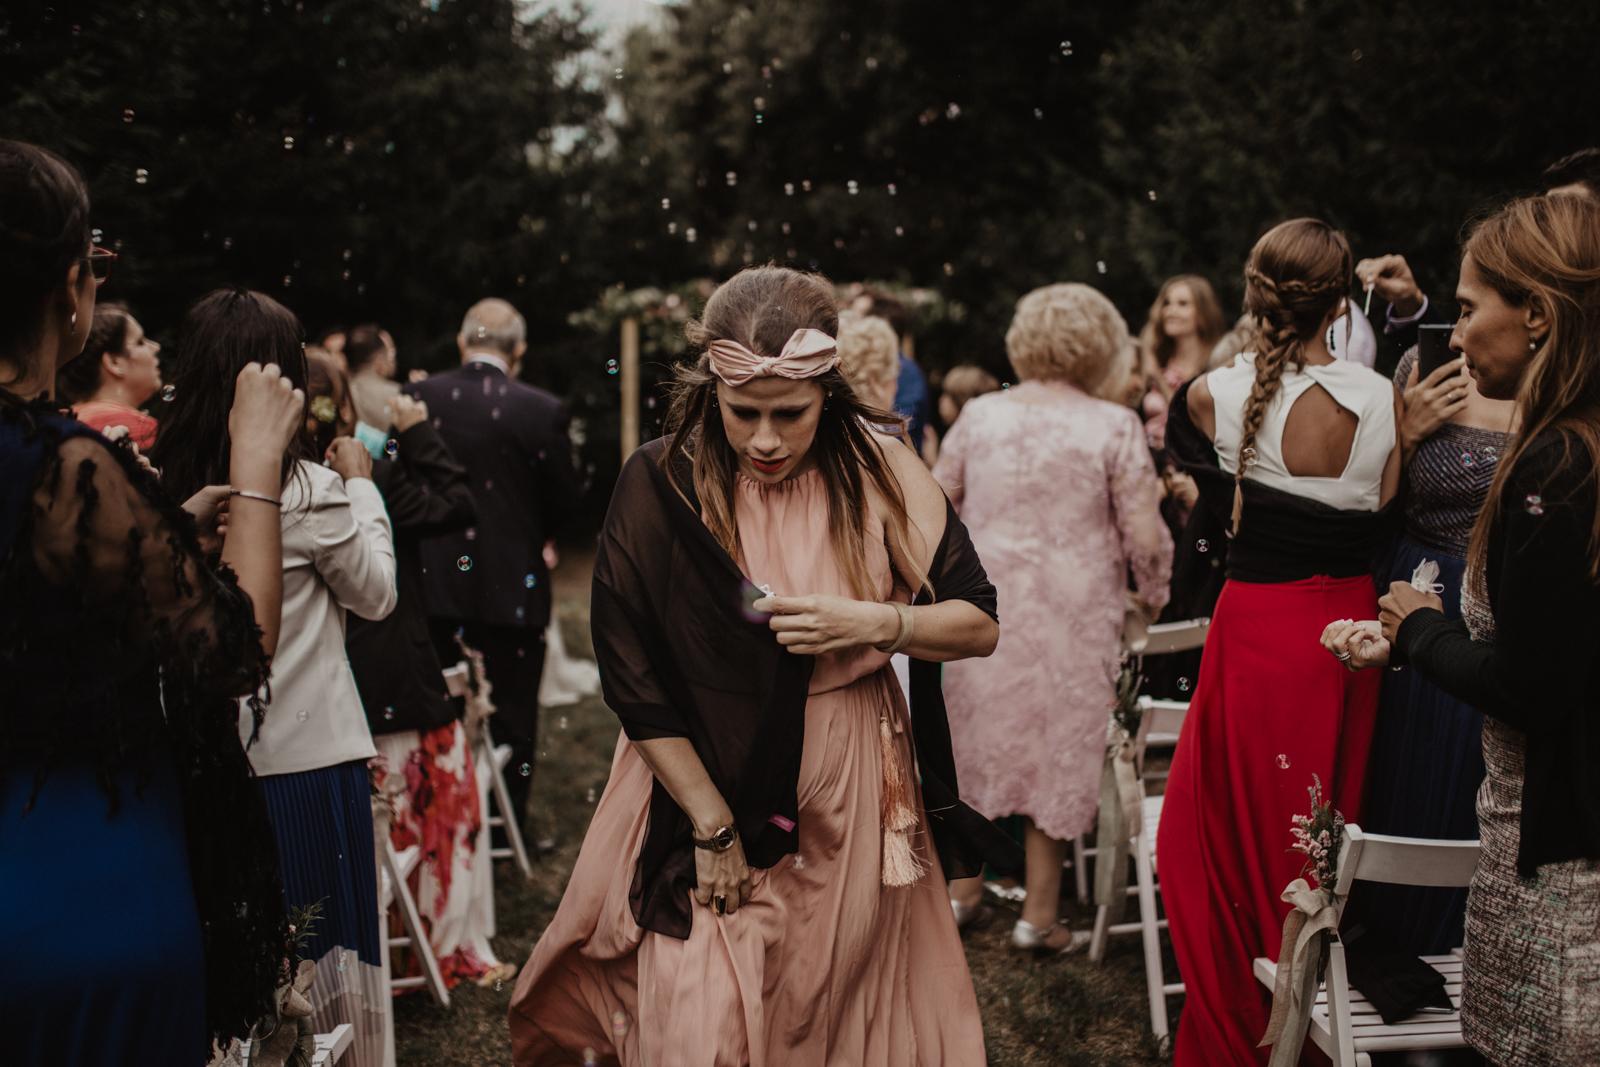 thenortherngirlphotography_photography_thenortherngirl_rebeccascabros_wedding_weddingphotography_weddingphotographer_barcelona_bodaenbarcelona_bodaenmaselmarti_bodarogeryvane-472.jpg